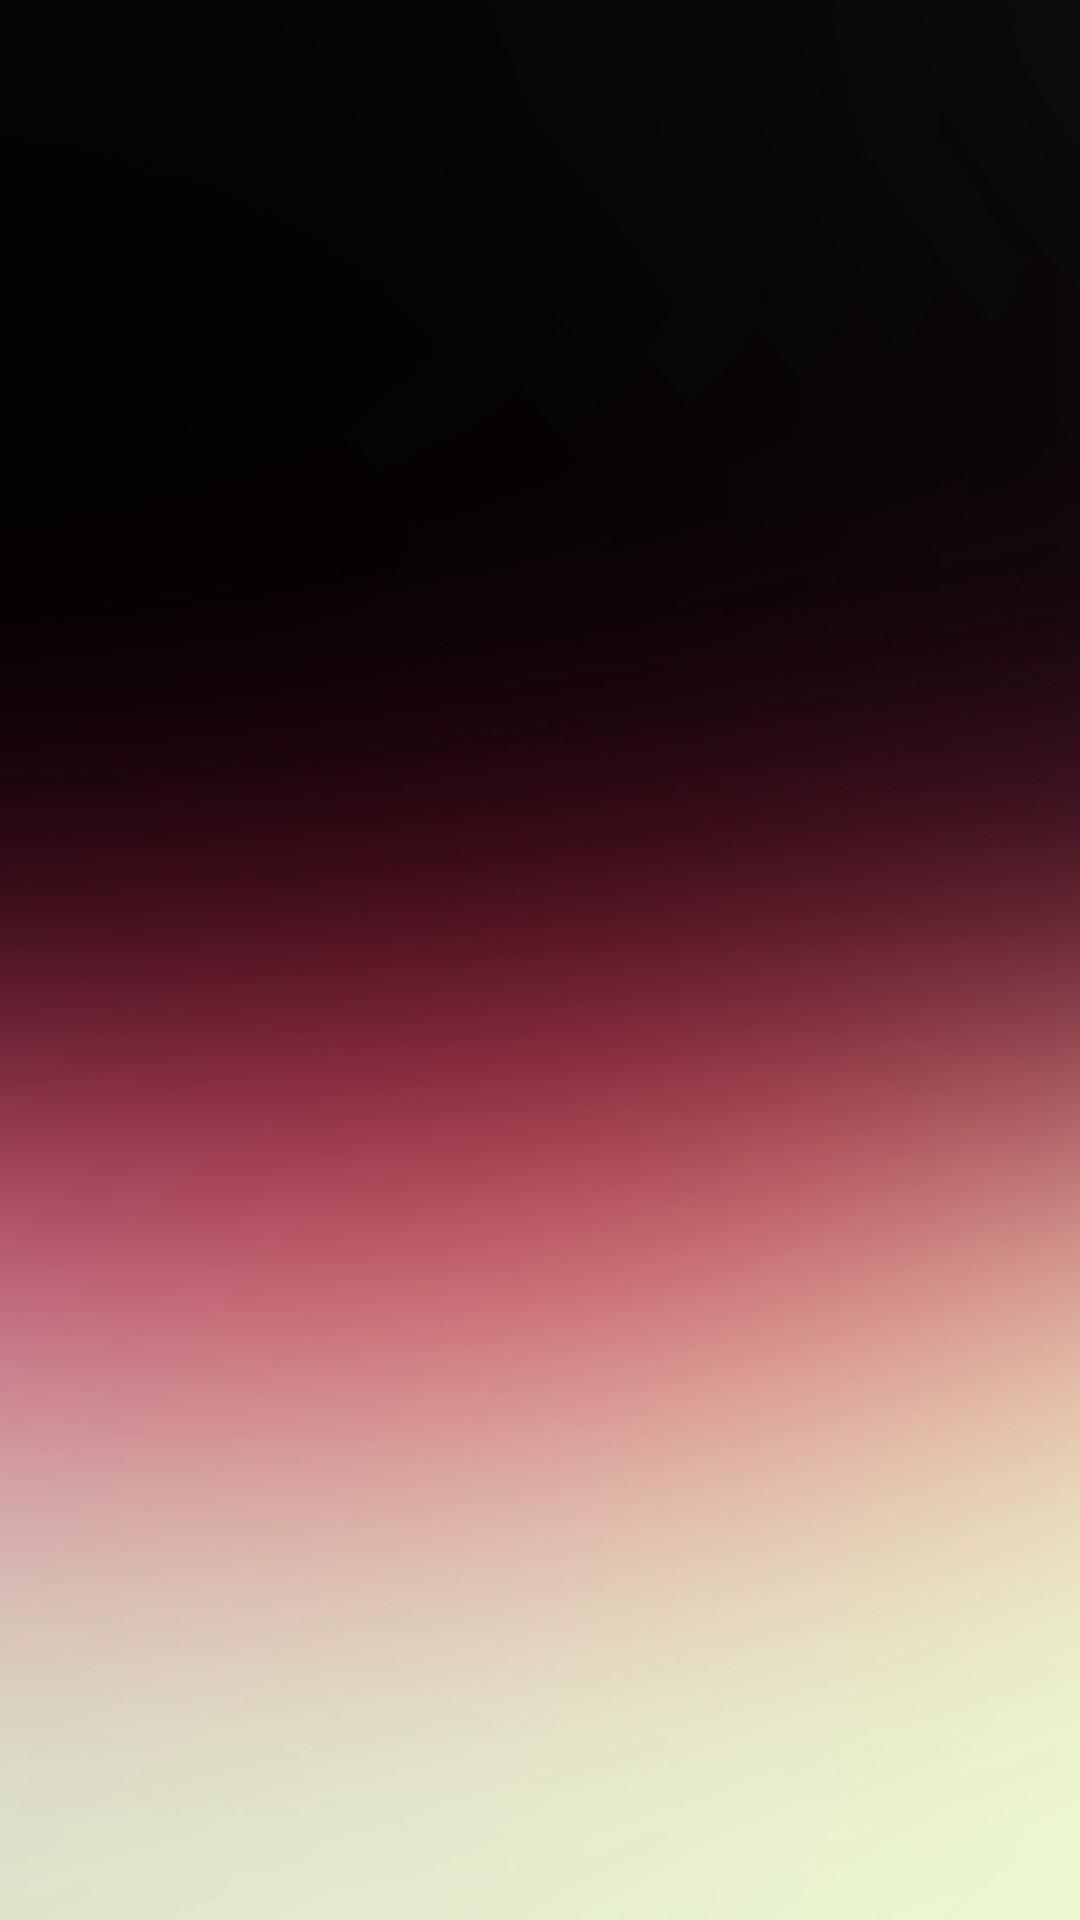 Dark Red Bokeh Gradation Blur Pink iPhone 6 Wallpaper .